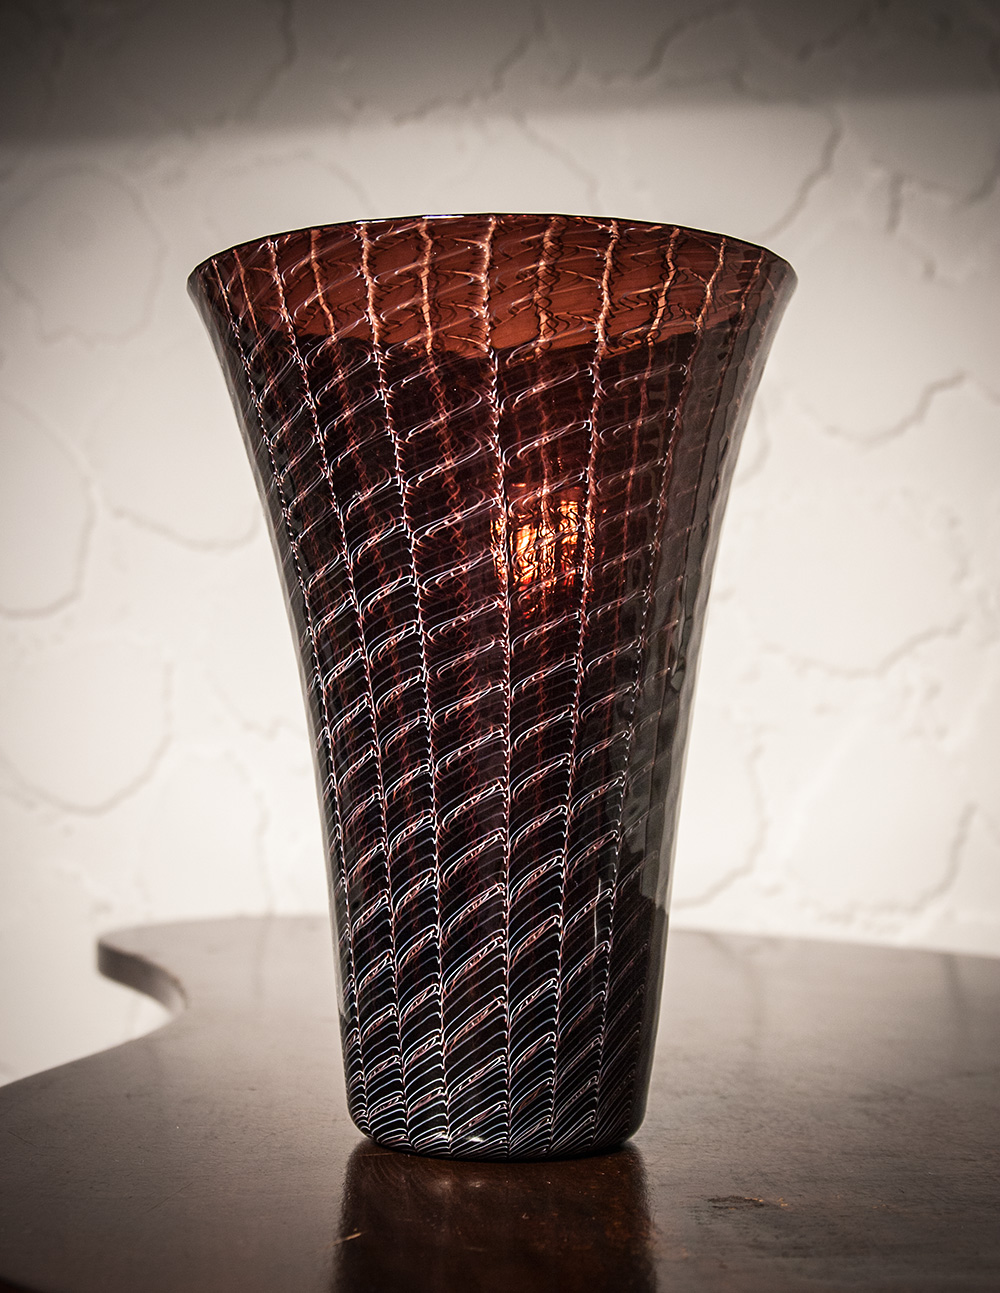 Archimede Seguso merletto vase, c. 1950, Seguso Vetri d'Arte